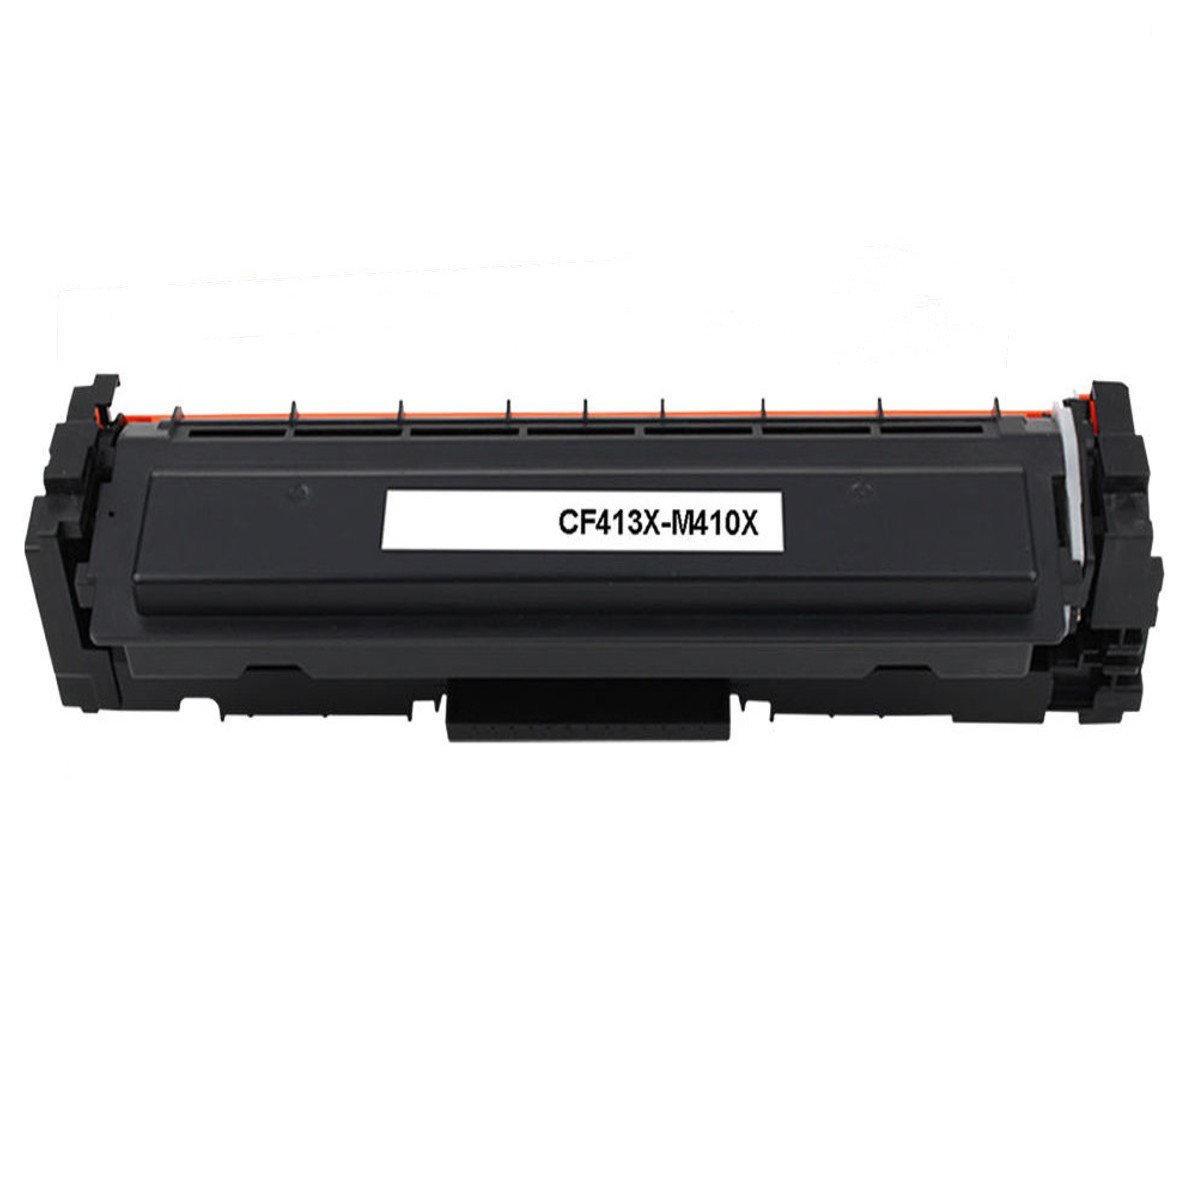 Compatible HP 410X CF413X Magenta Toner Cartridge High Yield- Economical Box